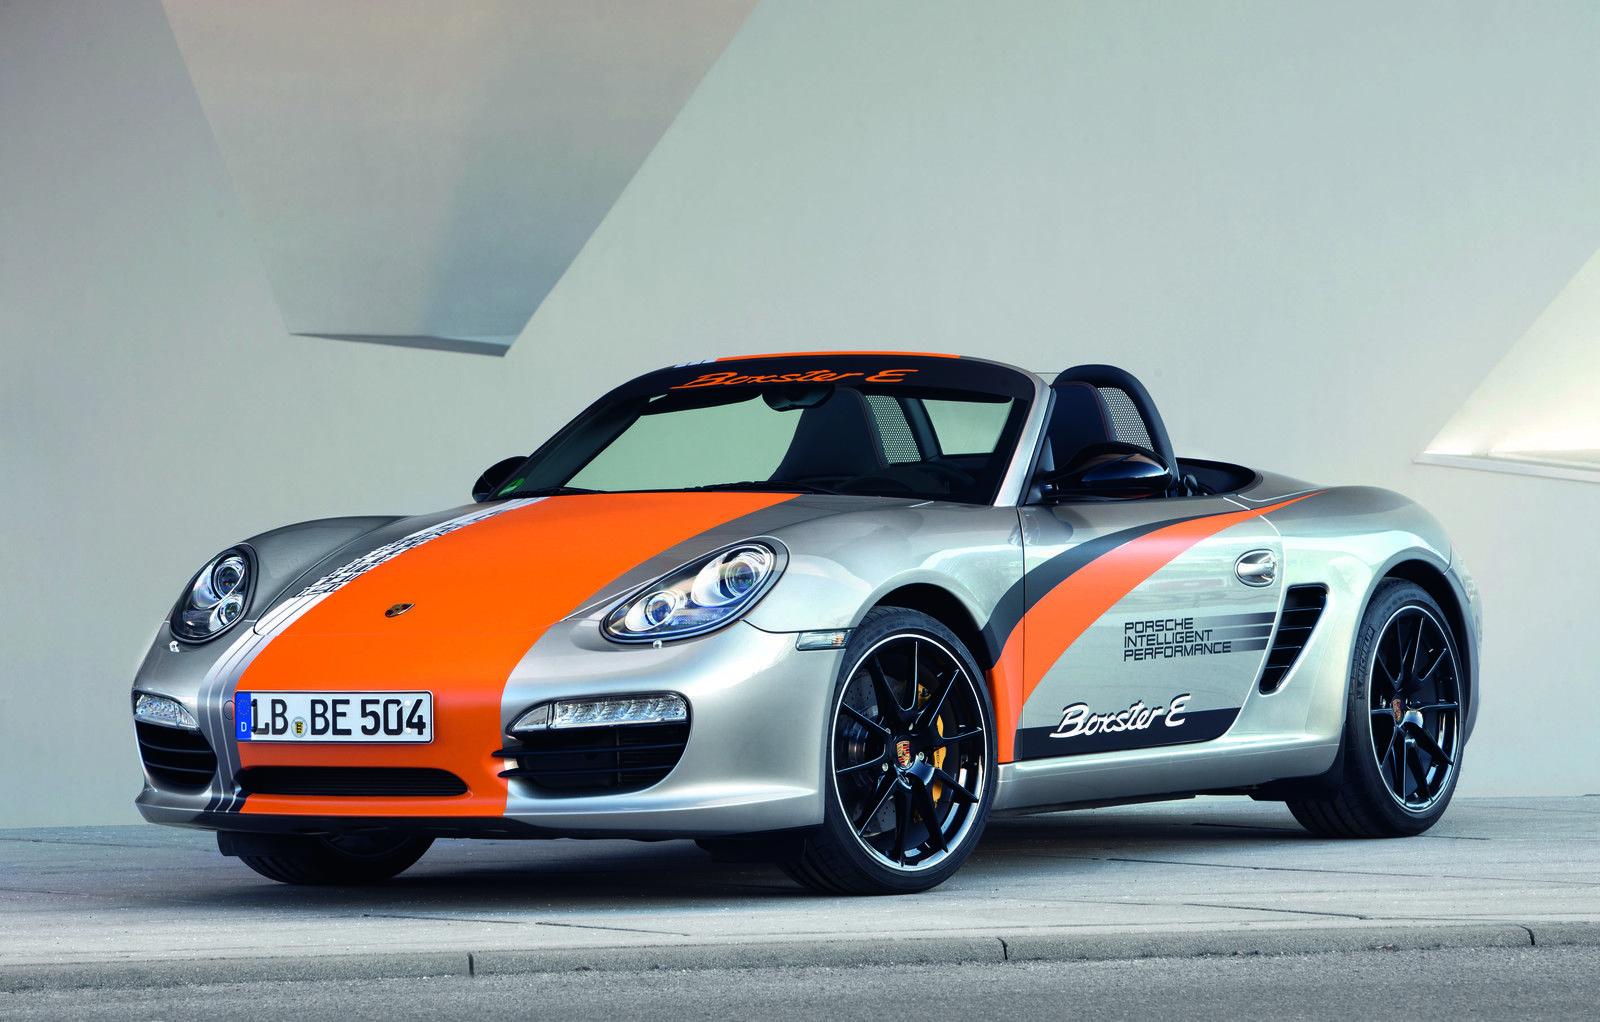 2013 Porsche Boxster E Porsche Boxster Porsche Boxter Electric